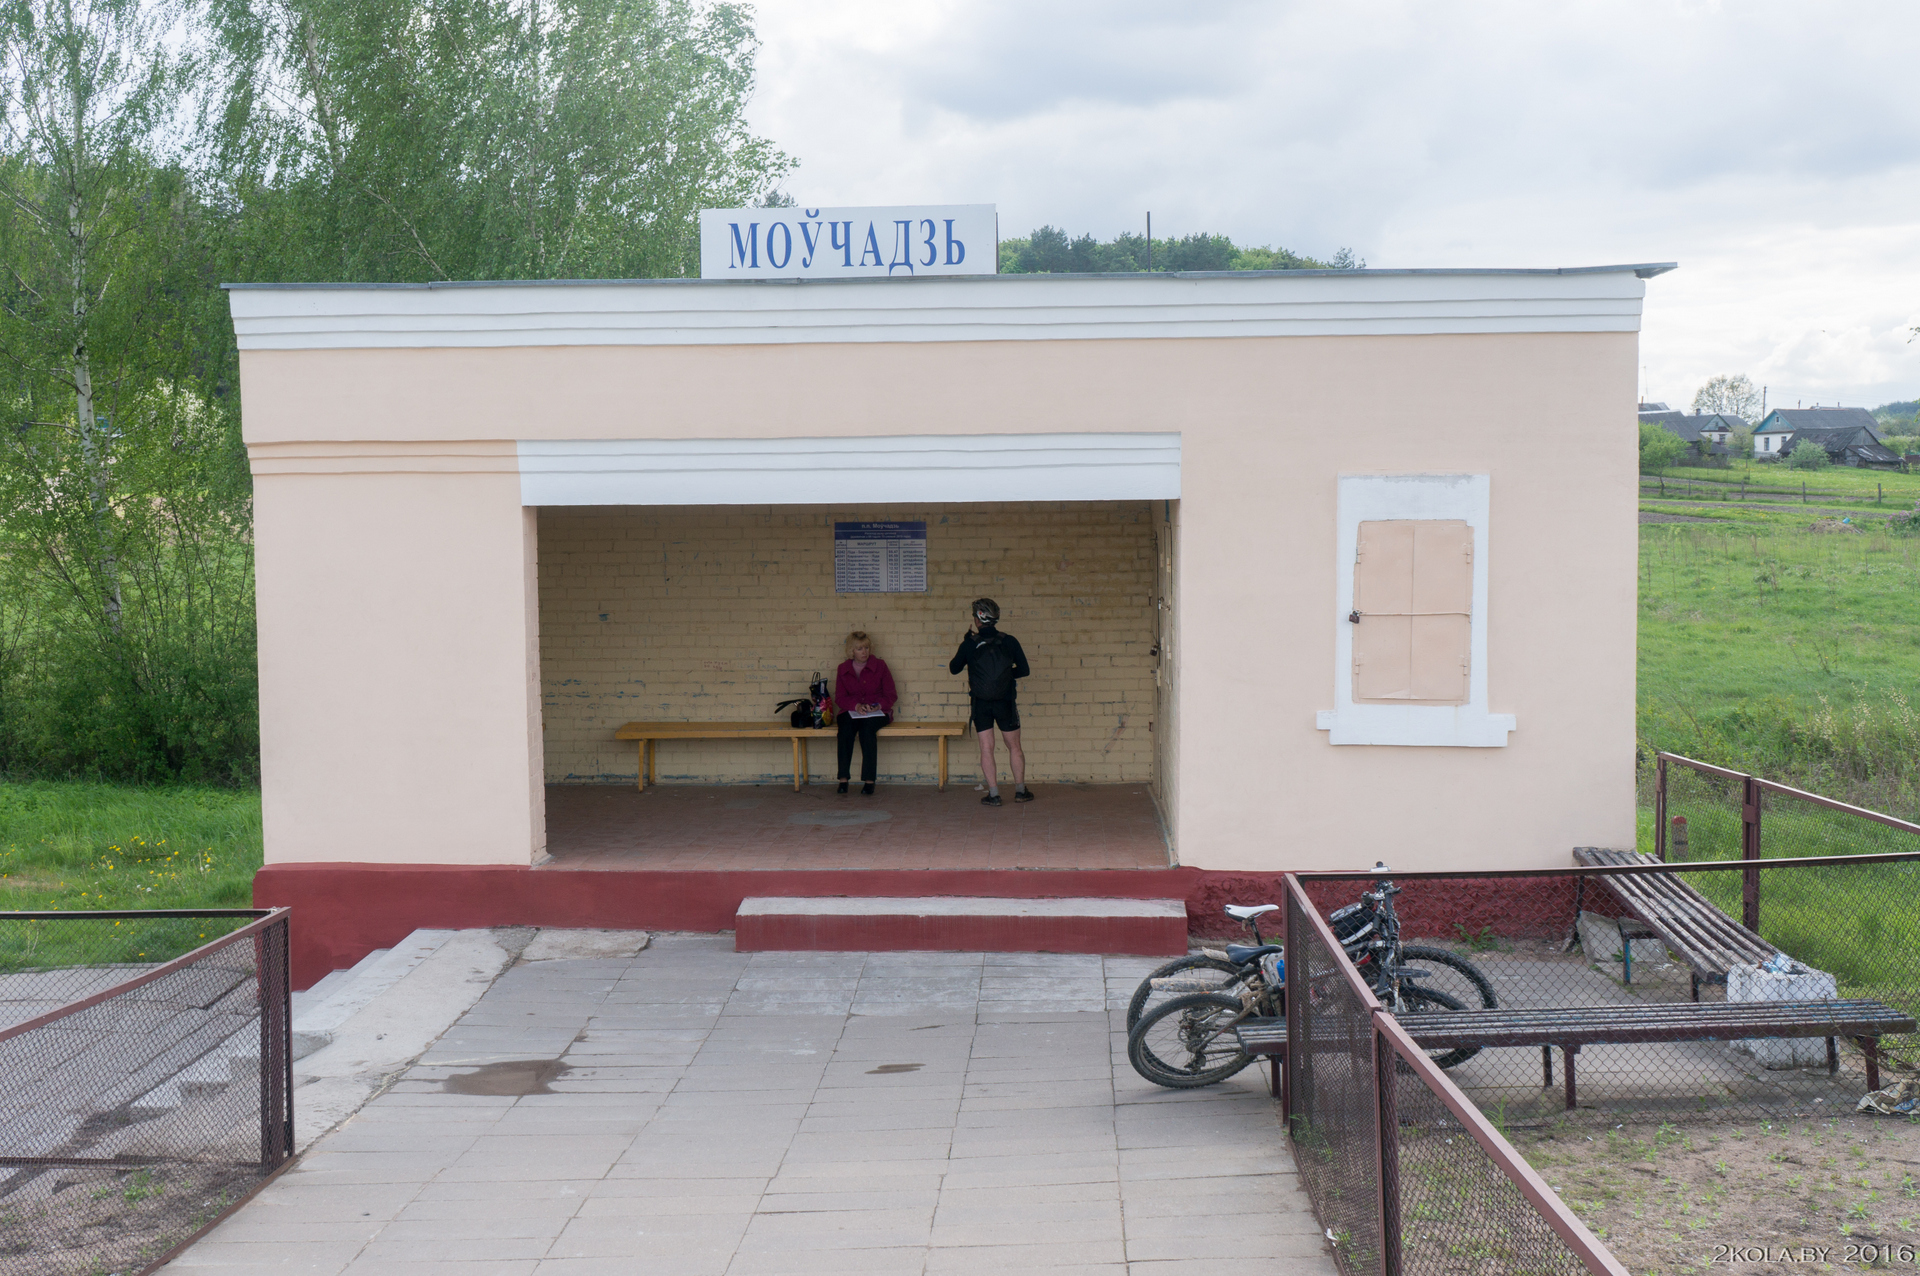 0 119c31 1b5222b2 orig - Покатушка Барановичи-Городище-Молчадь